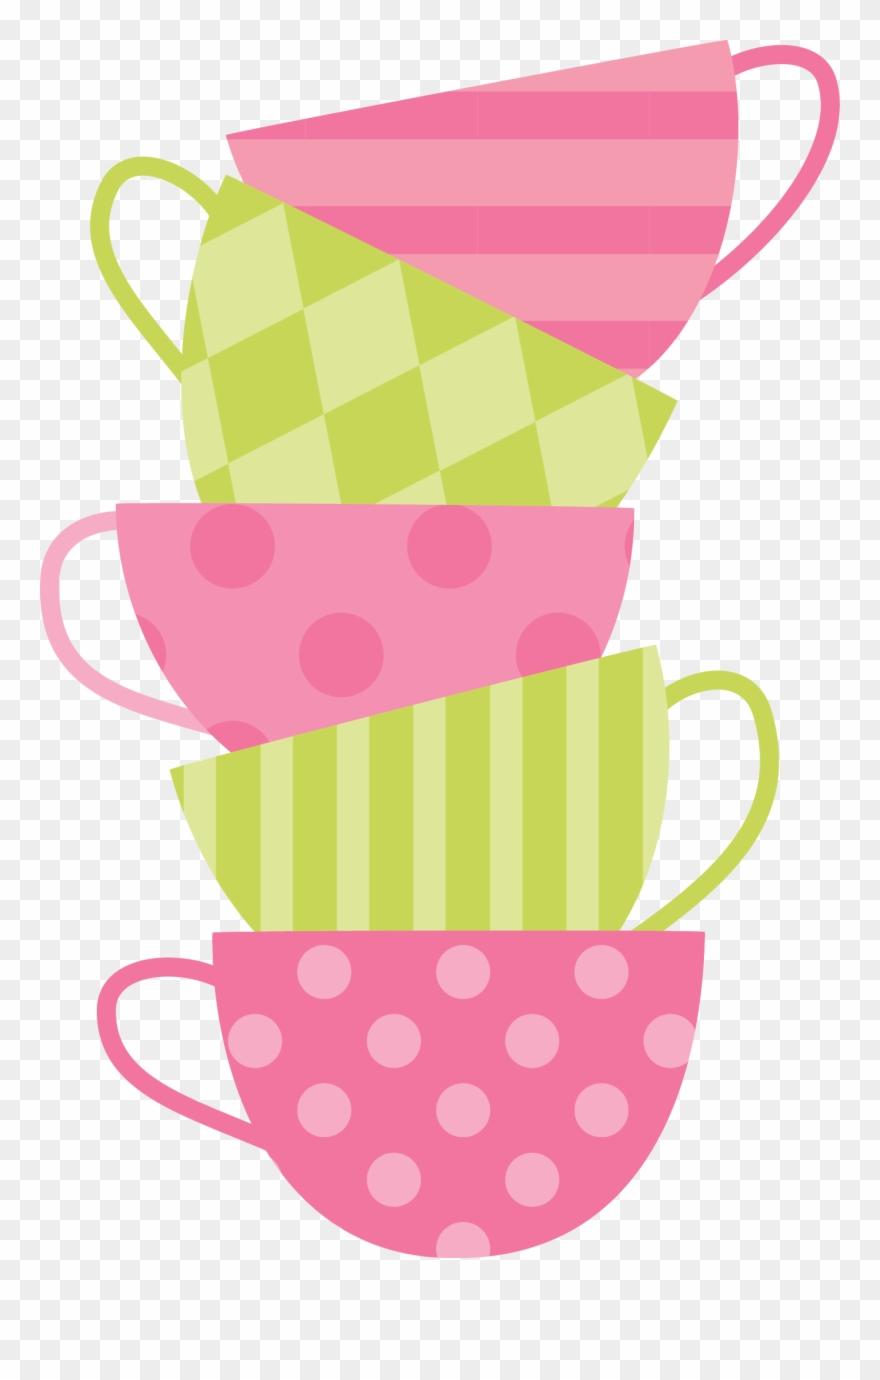 png transparent Alice in wonderland teacup clipart. Vintage clip art watercolor